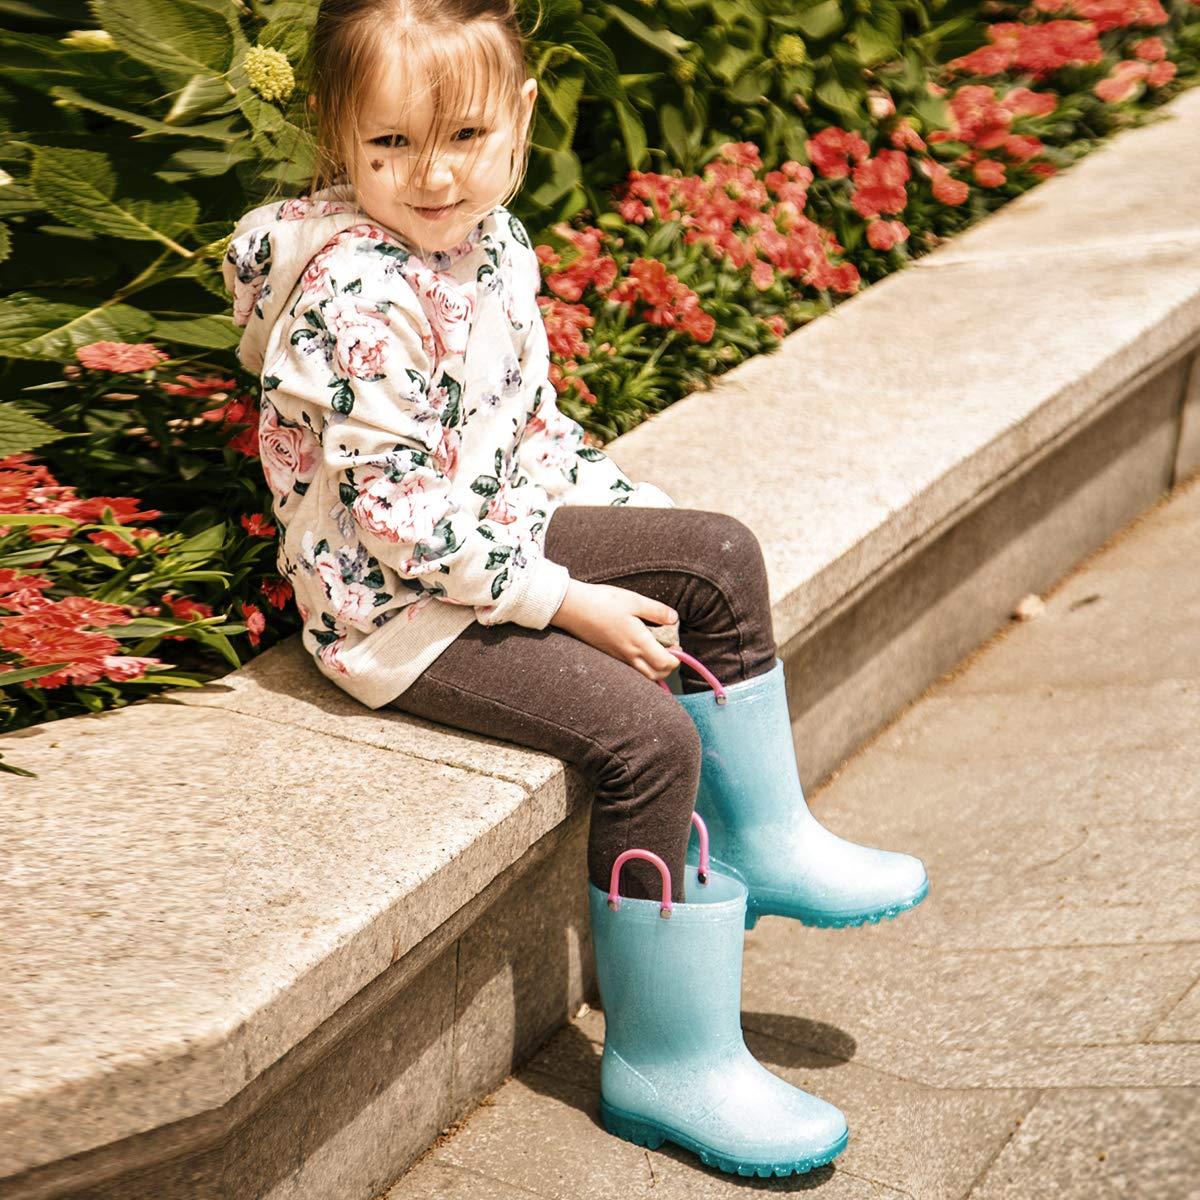 KomForme RPGL054-1M K Light Up Kids Rain Boots Glitter Girl Boots Blue by KomForme (Image #6)